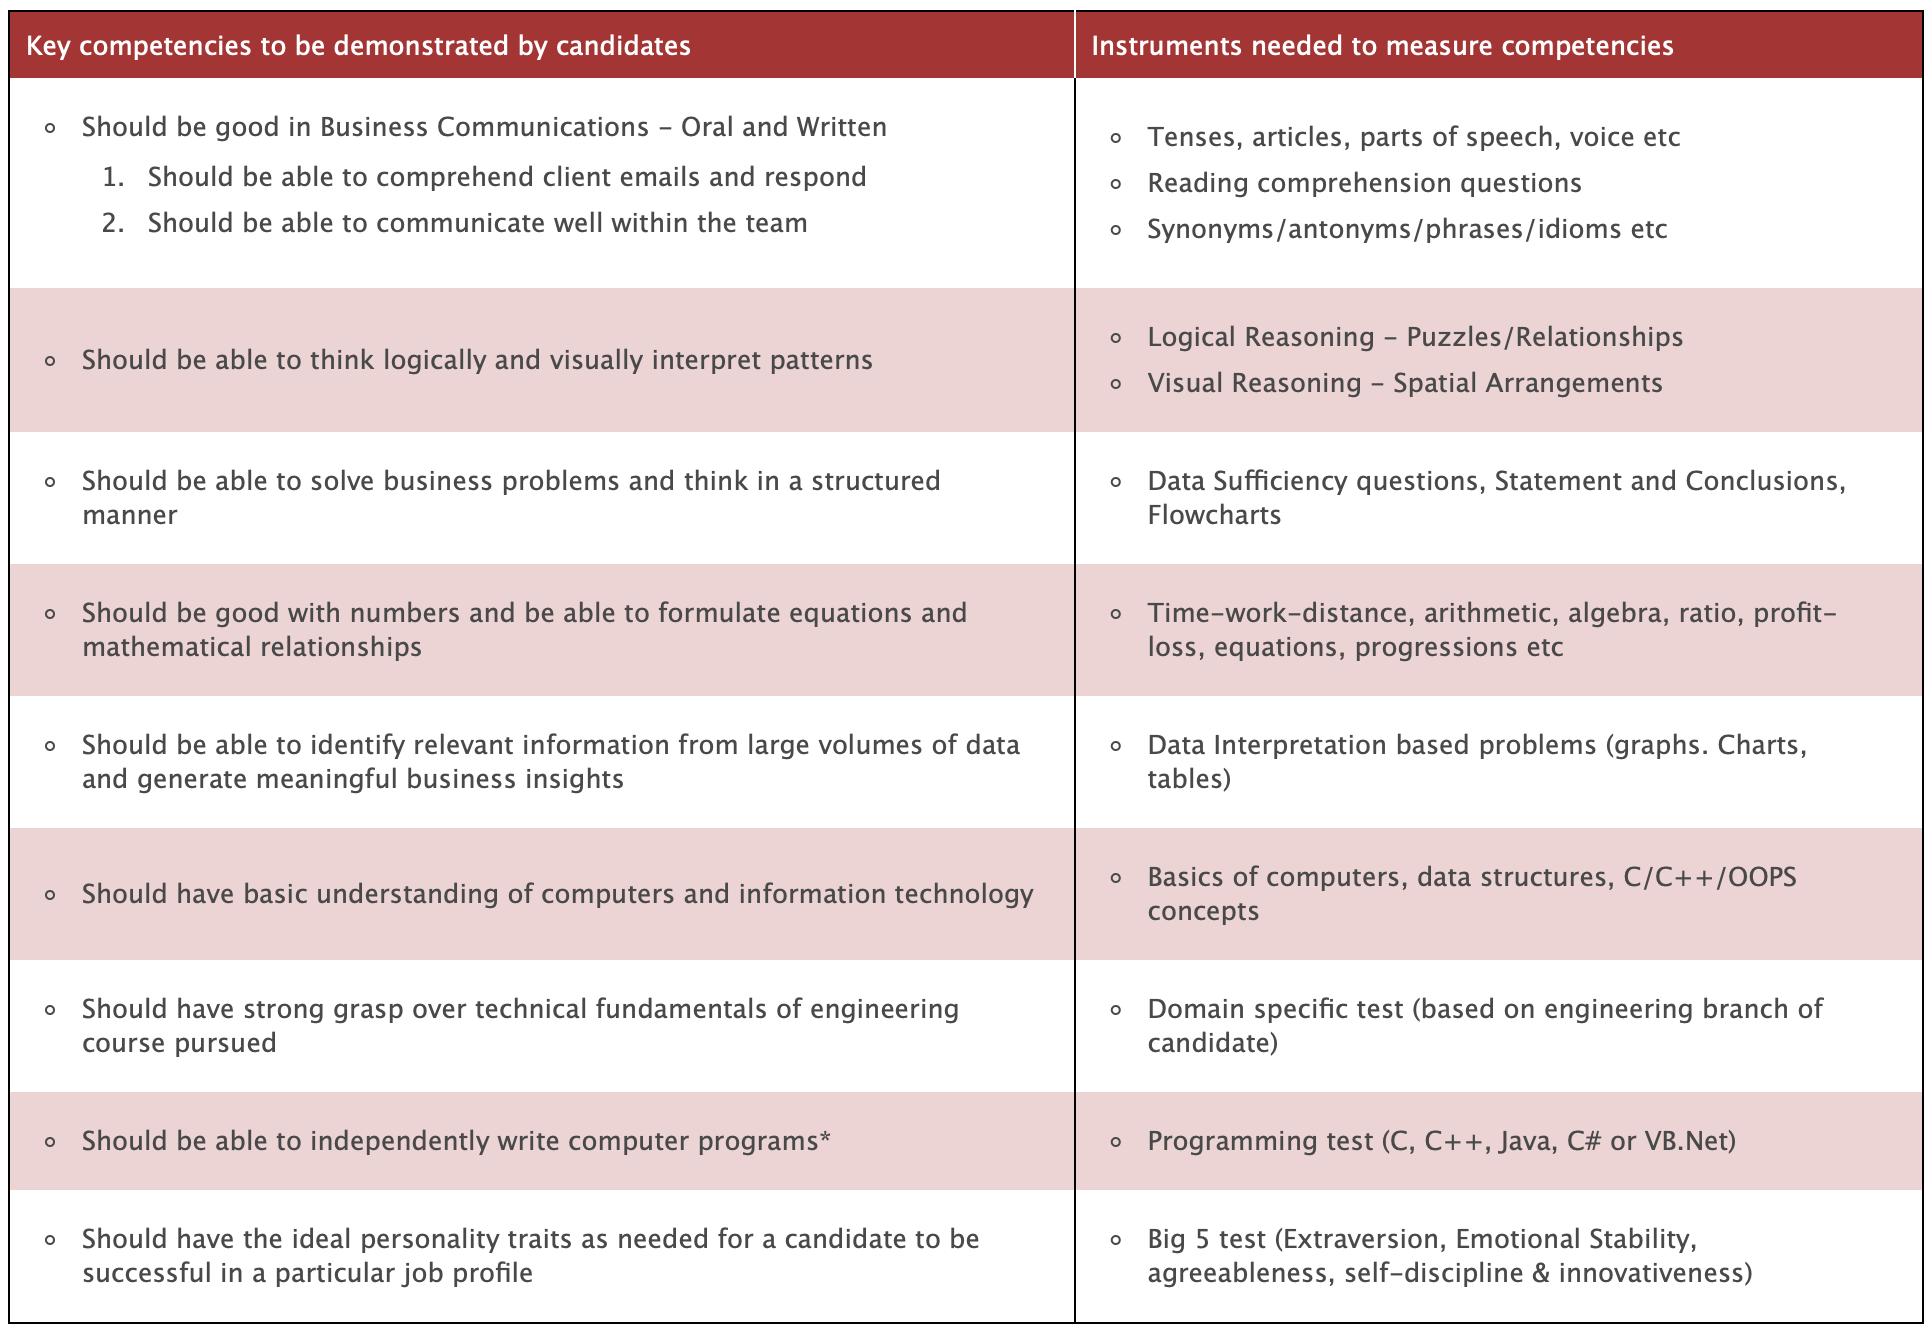 cocubes syllabus and test pattern analysis